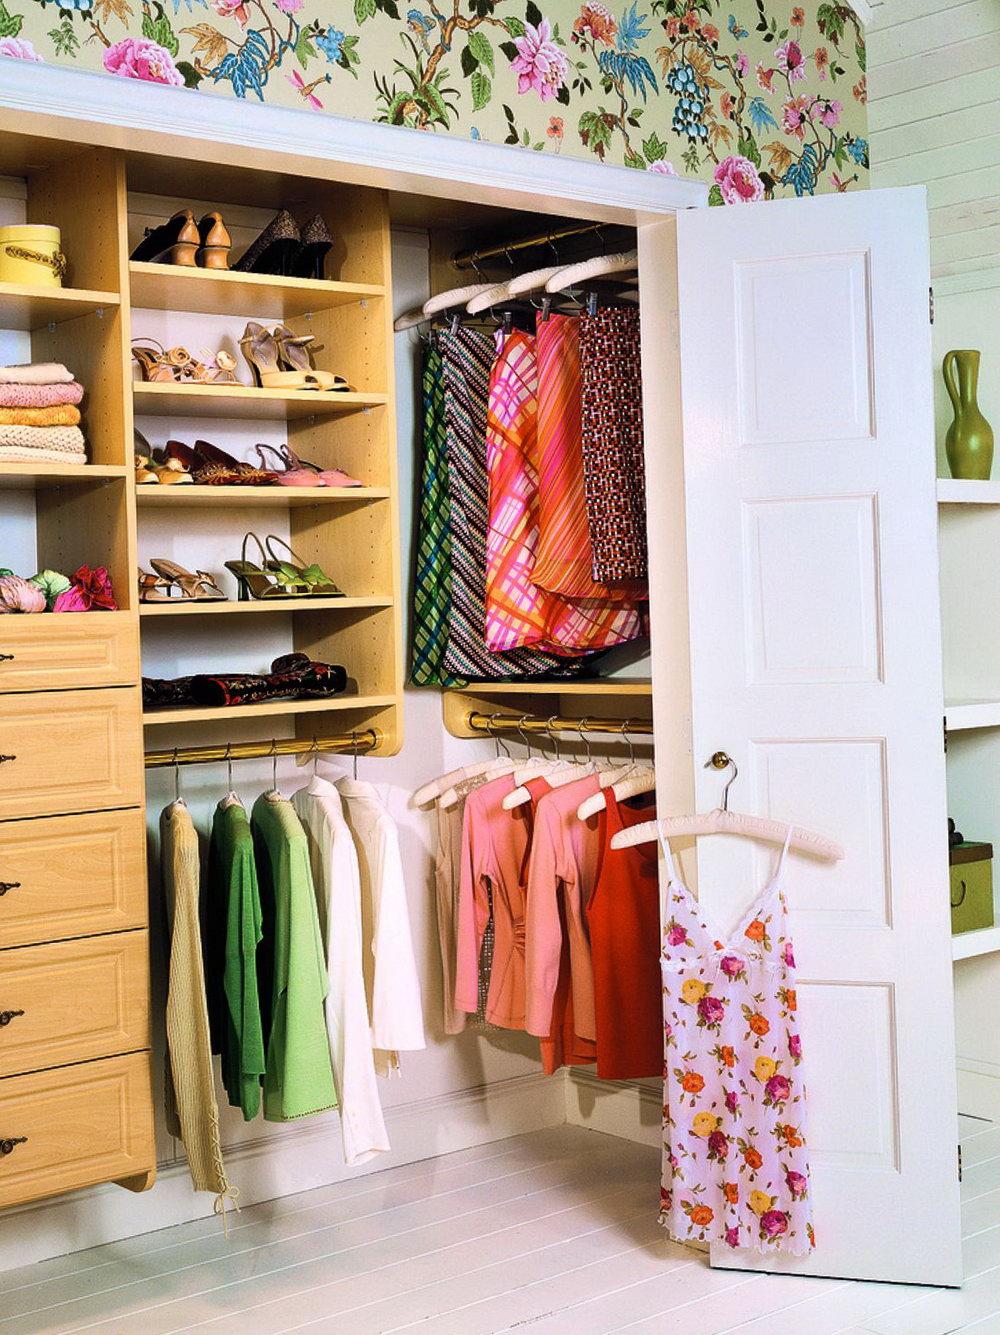 Reach In Closet Organizer Ideas